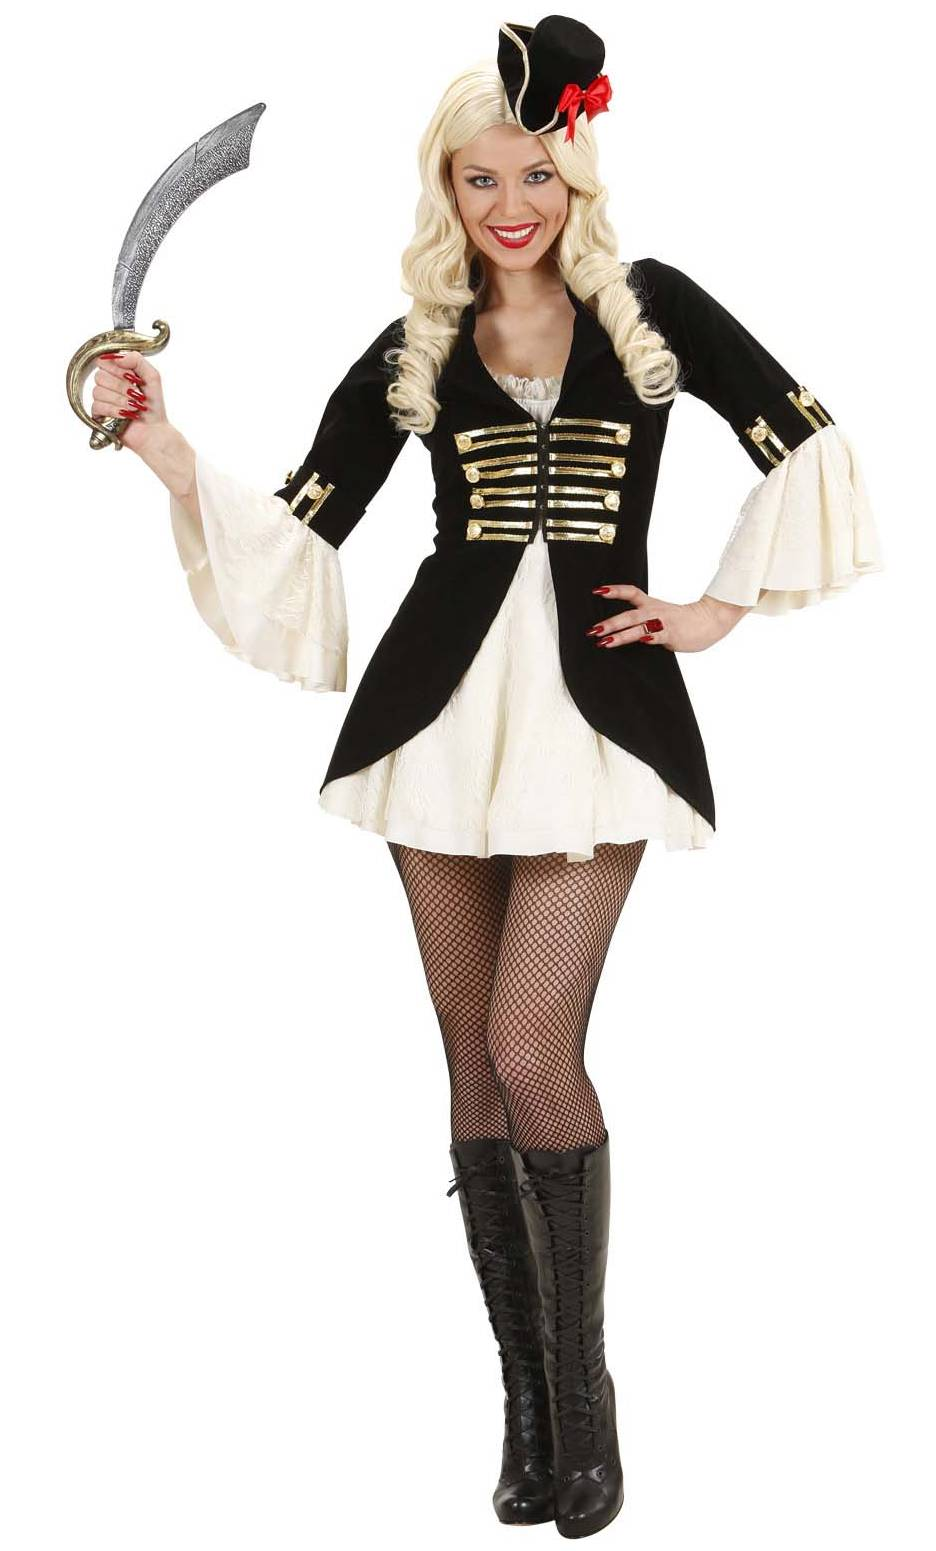 Costume de pirate femme